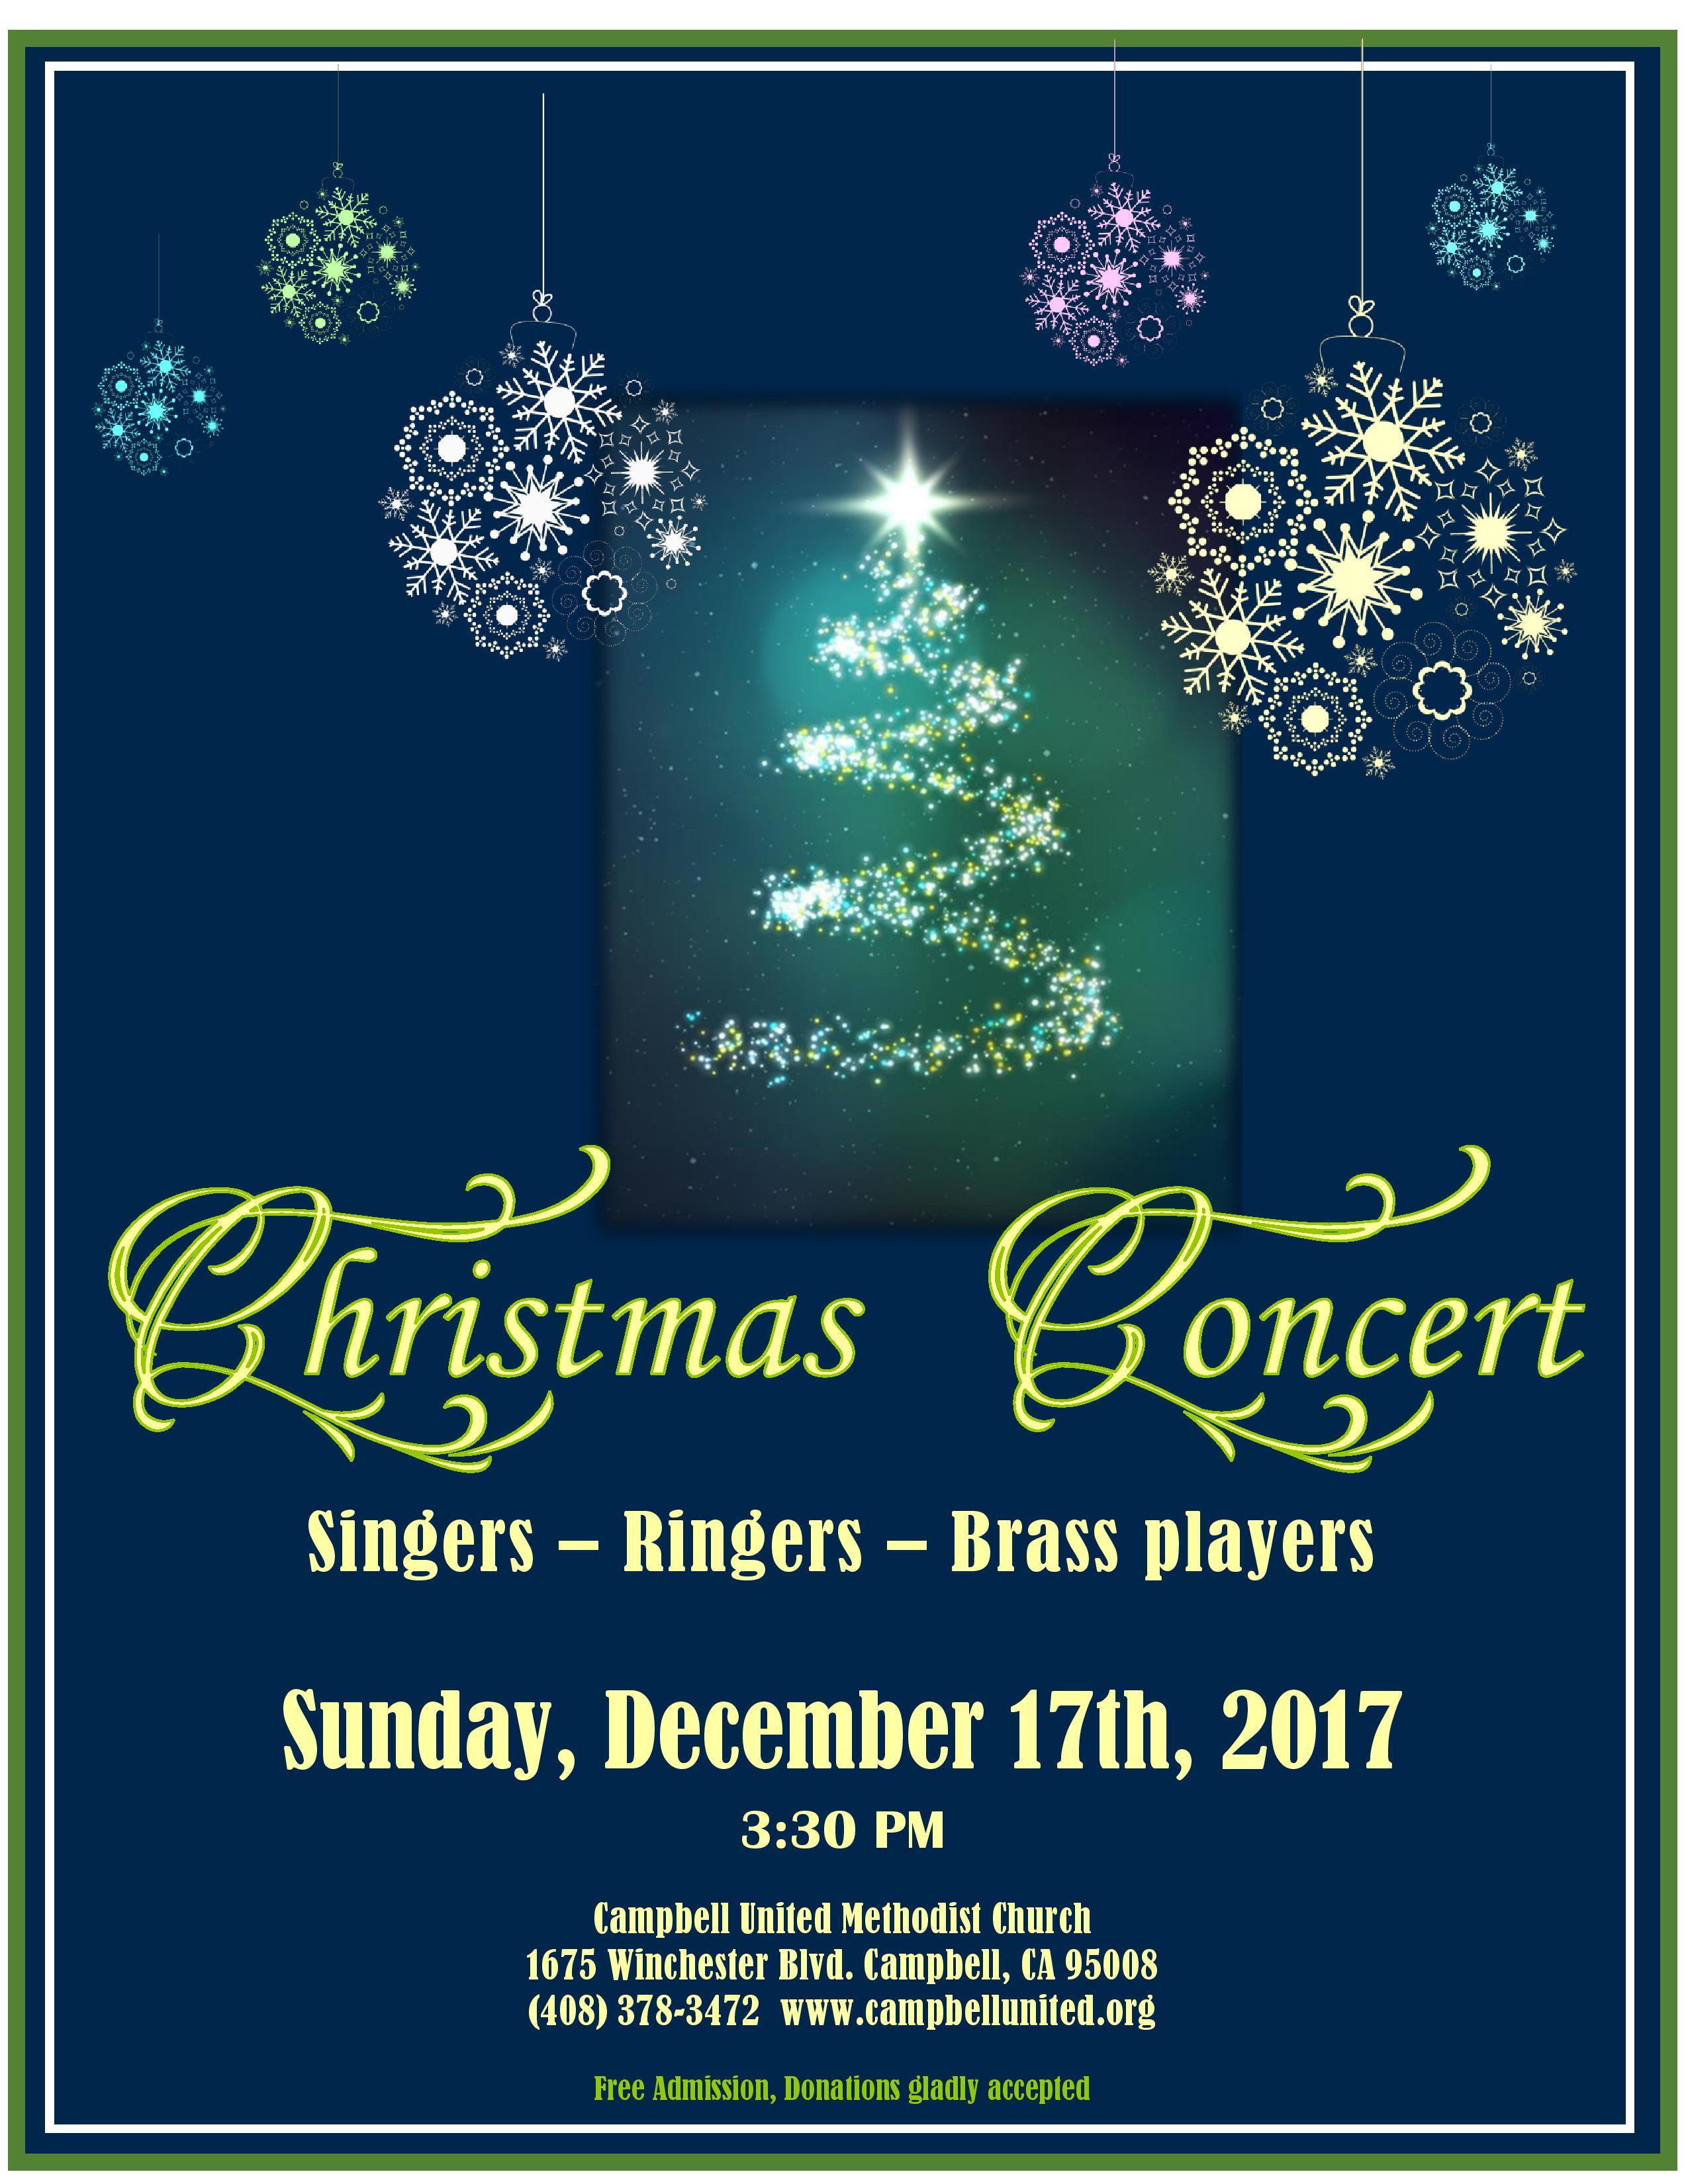 Annual Christmas Concert